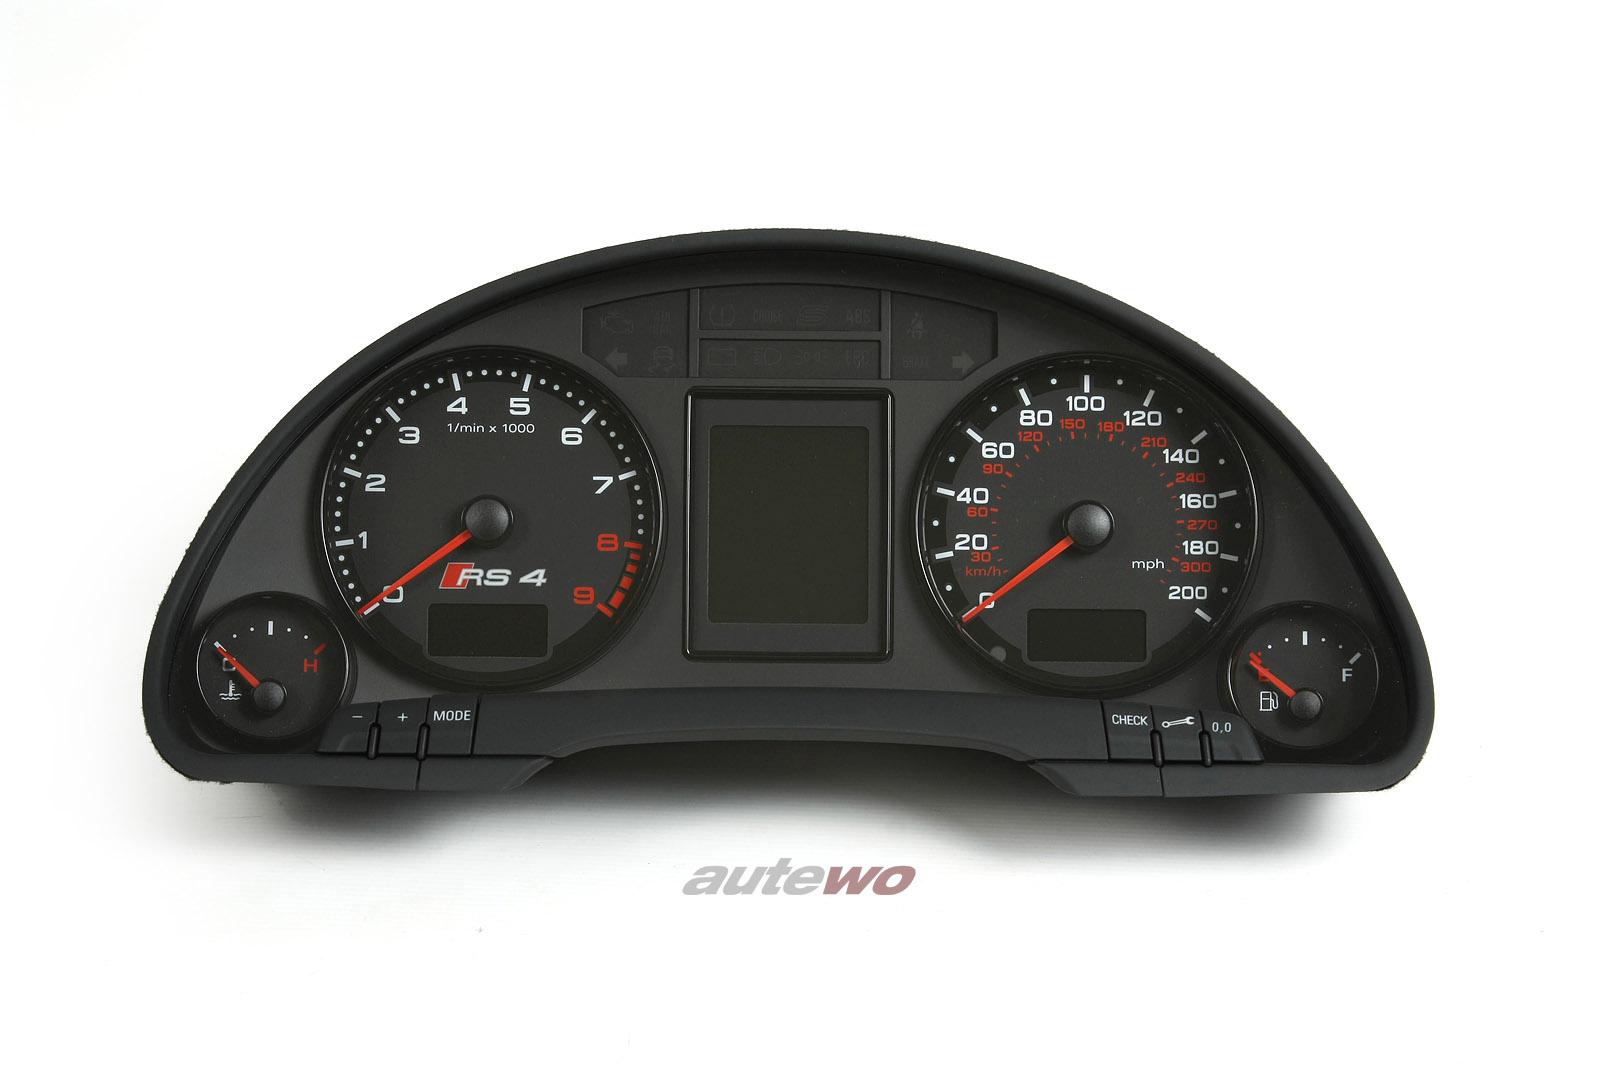 8E0920985P NEU Audi RS4 8E Kombiinstrument mit Meilentacho